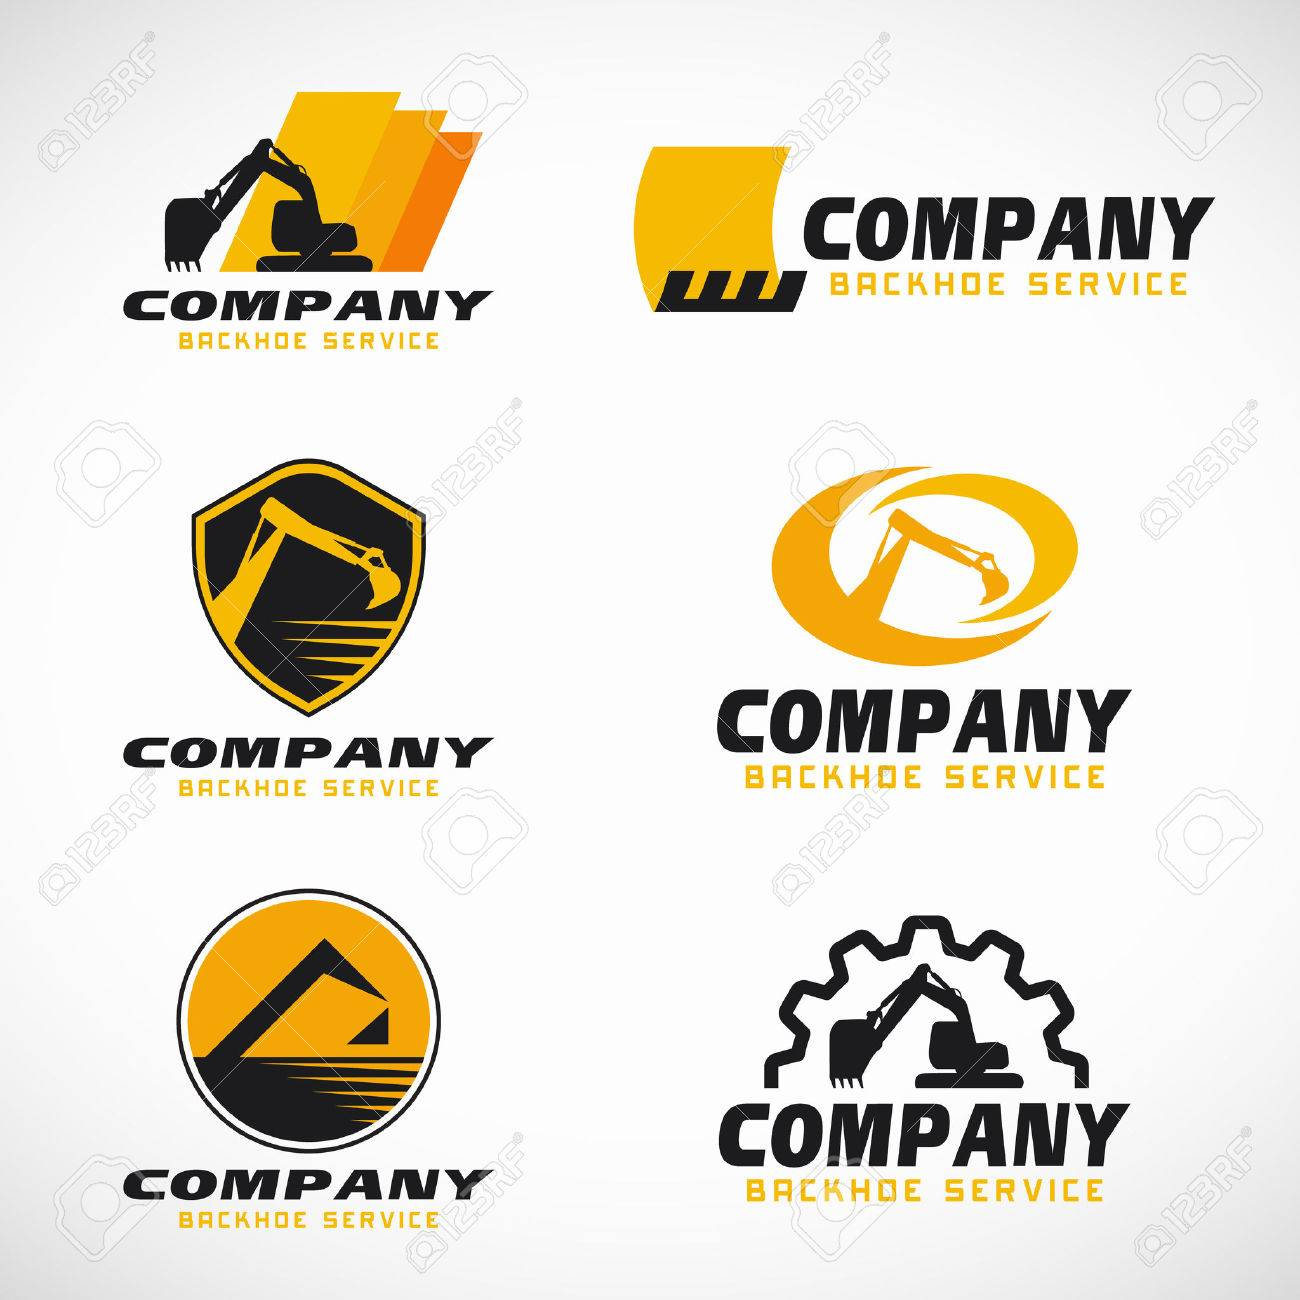 Yellow and black Backhoe service logo vector set design.